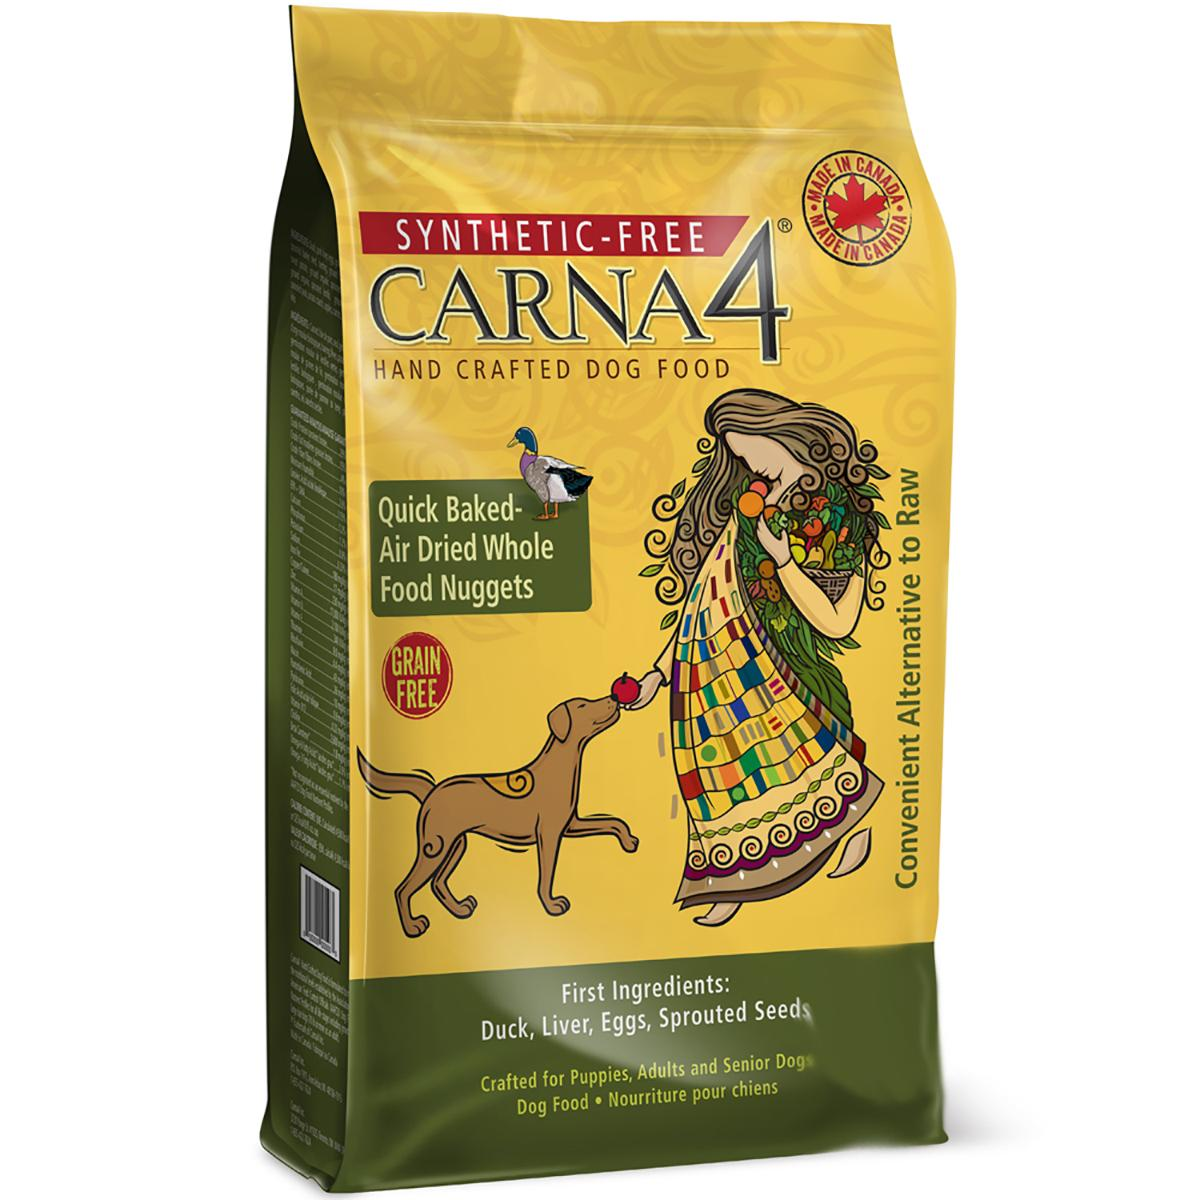 Carna4 Grain-Free Dry Dog Food - Duck Recipe